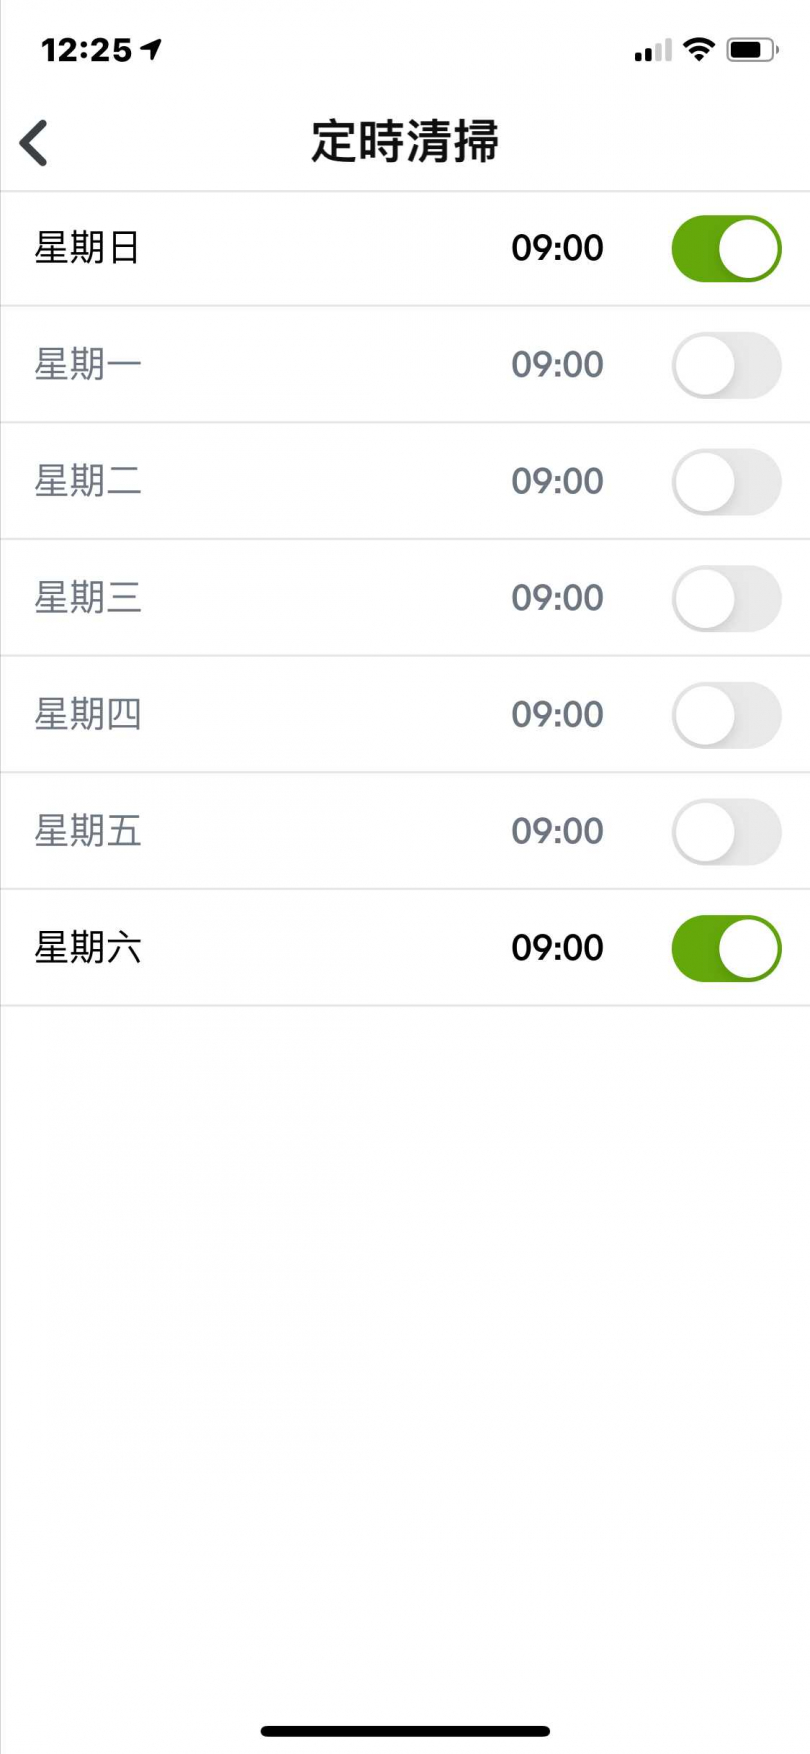 App介面較陽春,可設定「定時清掃」,以及看到每次清掃耗時的時間。(App實測截圖)